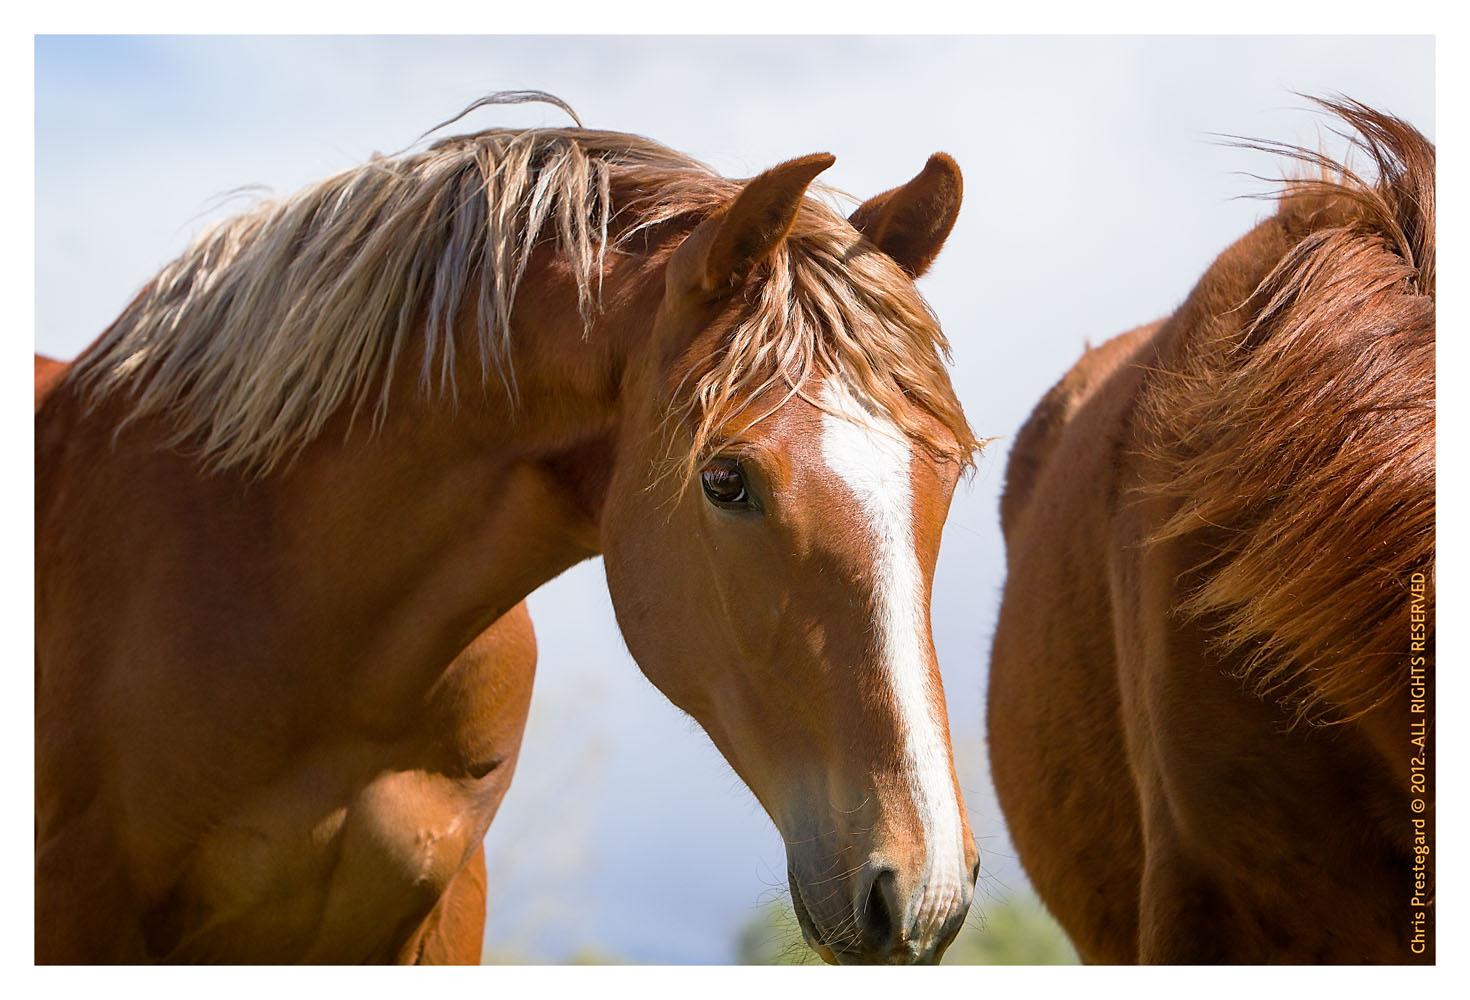 Horse3849-Feb17-2012